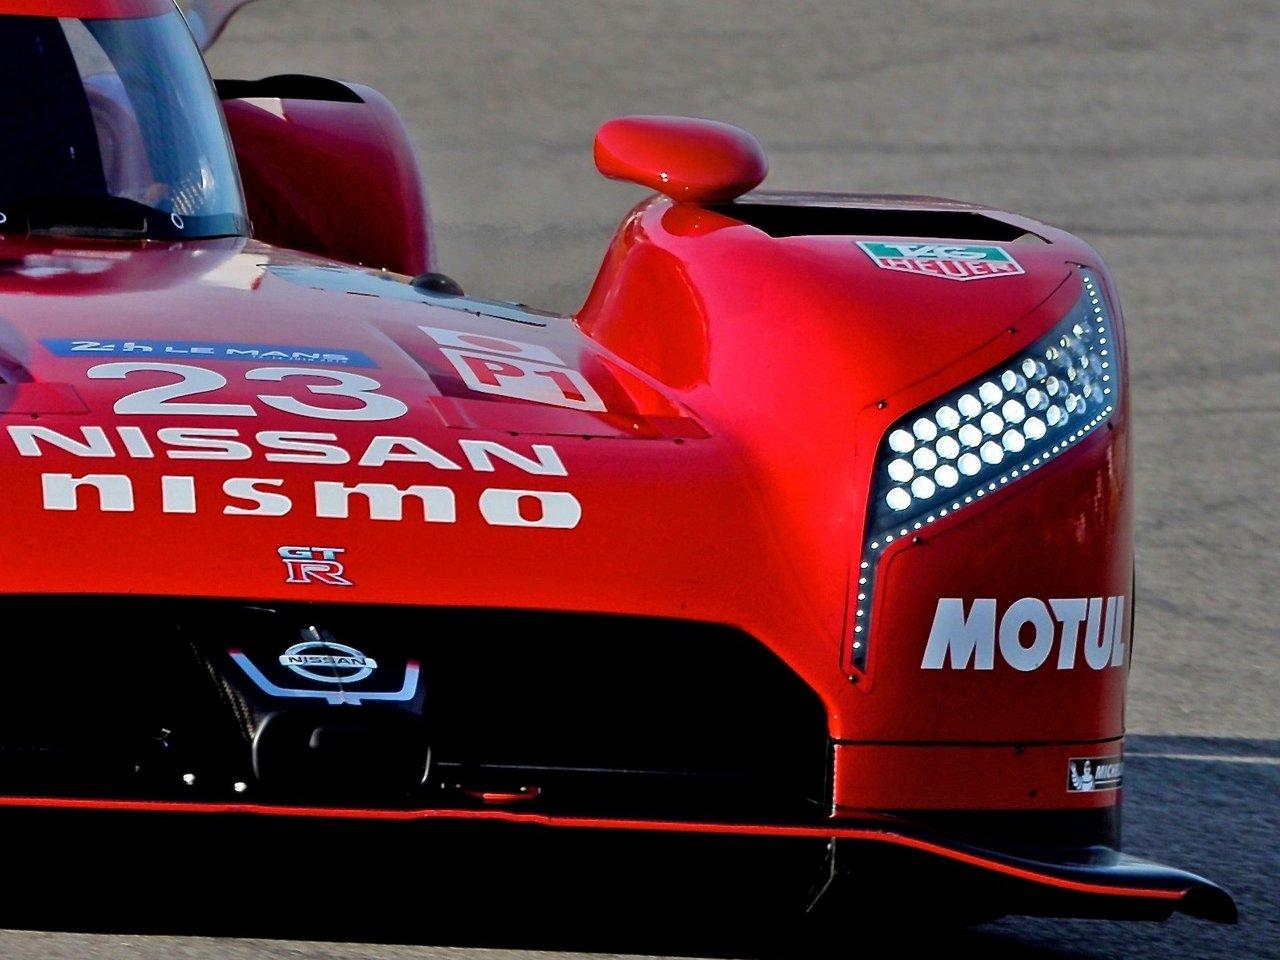 nissan-gt-r_lm-nismo-le-mans-2015-world-endurance-racing-hybrid-0-100_12